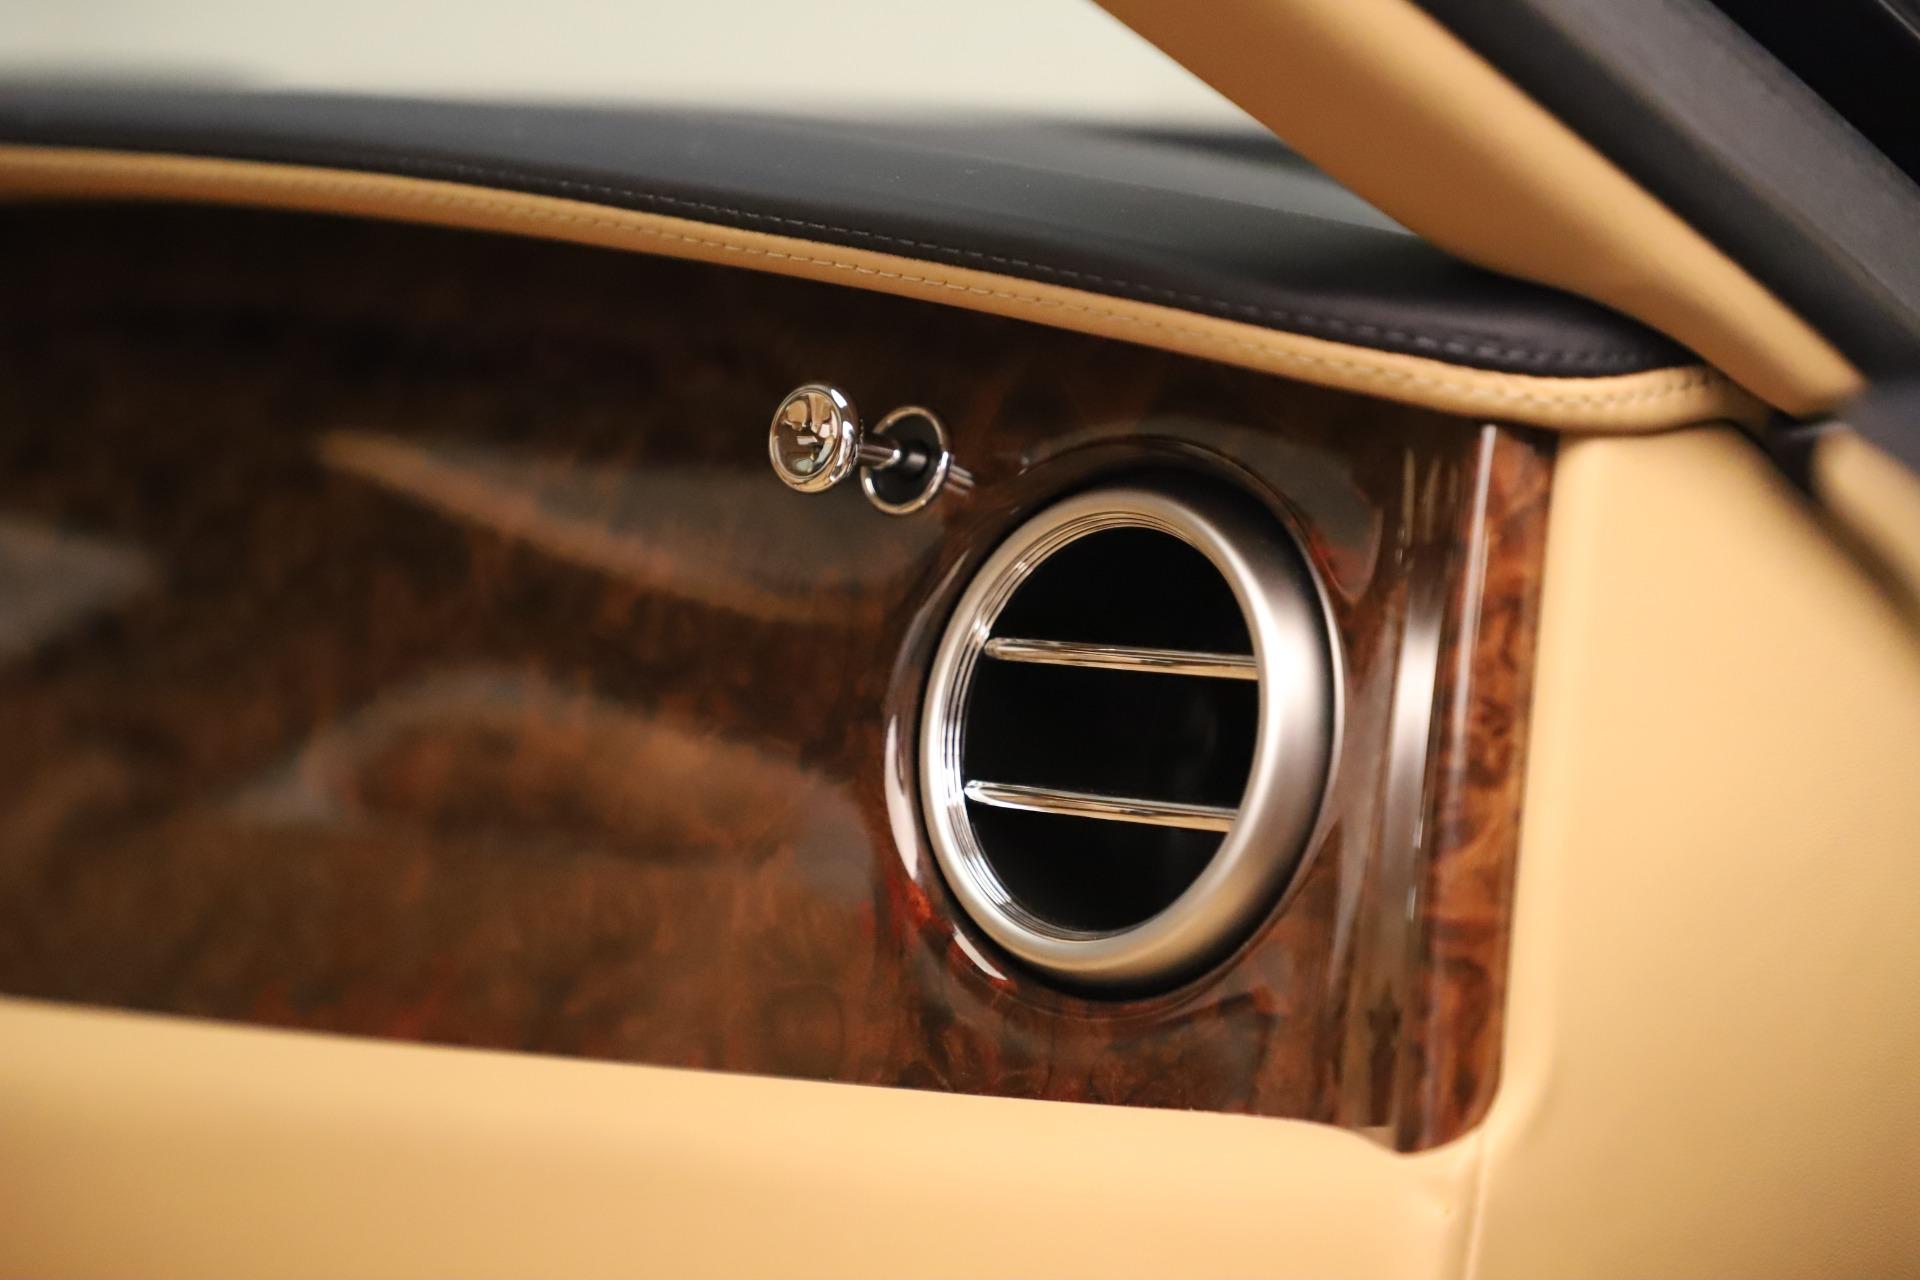 Used 2016 Bentley Flying Spur W12 For Sale In Westport, CT 3171_p32